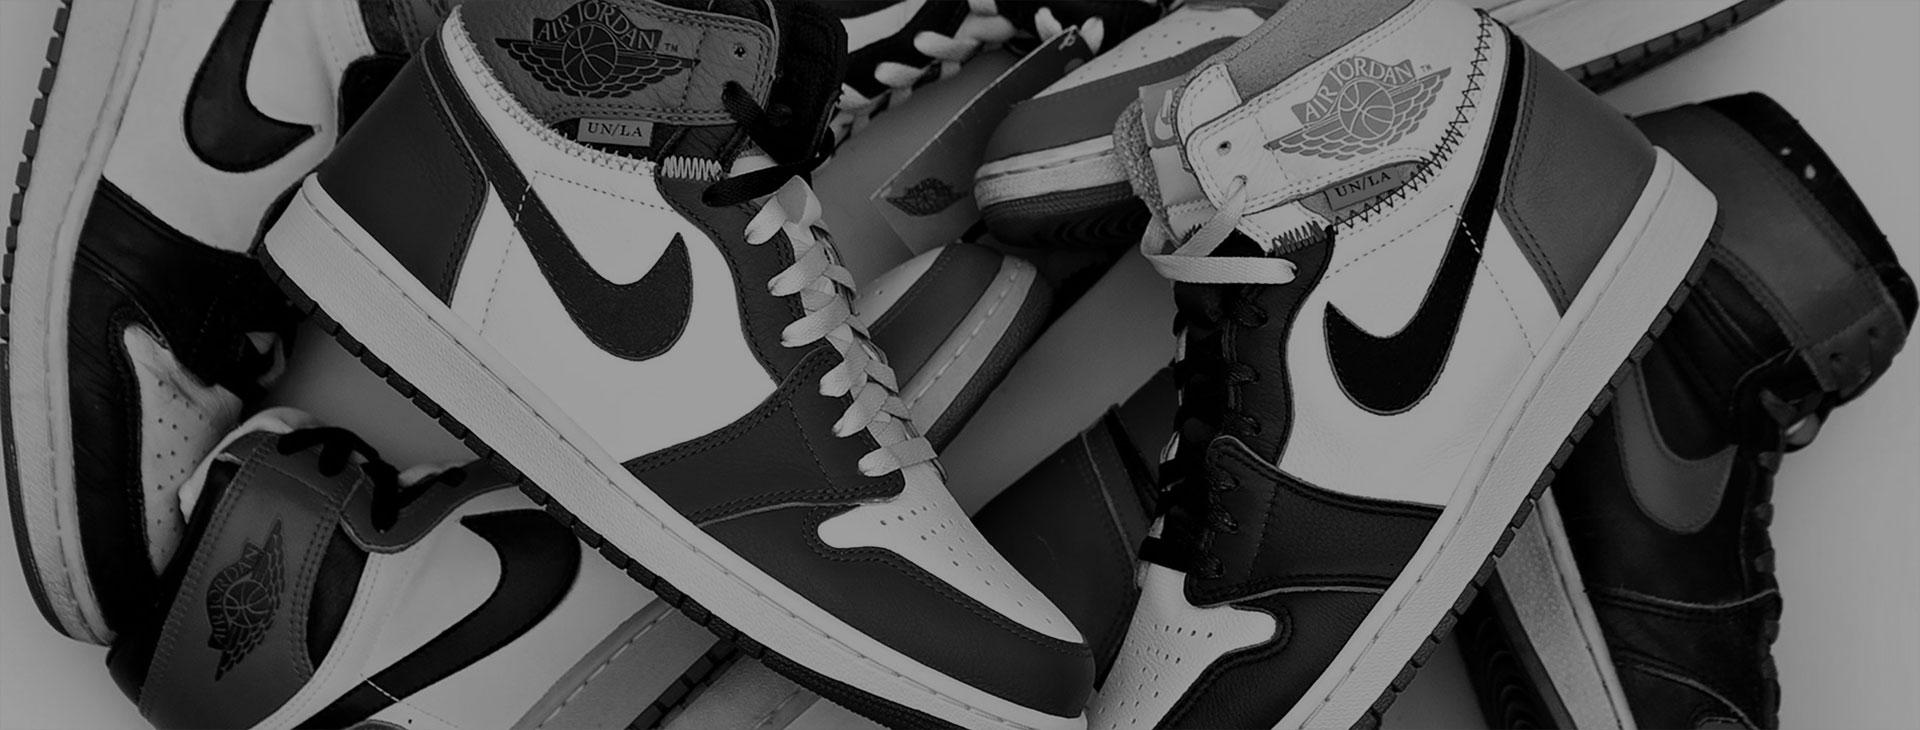 a1cefc1492c7 The 10 Best Jordans Of 2018 - SneakerNews.com